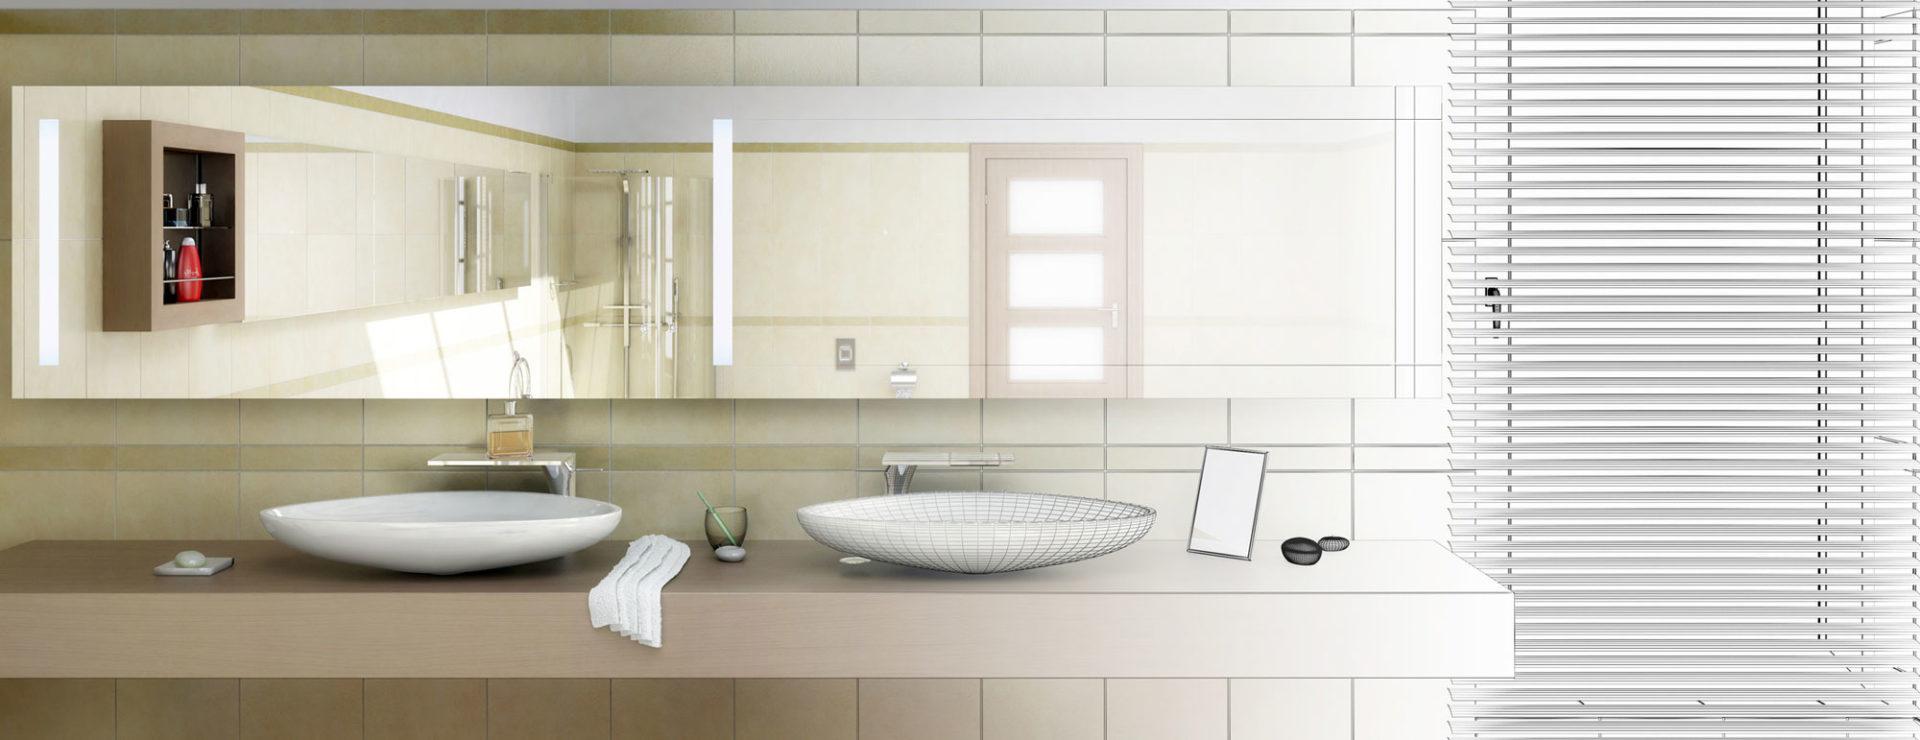 Badgestaltung Design | Badplanung Badgestaltung Bad Design Schonfeld Gmbh Sanitar Heizung